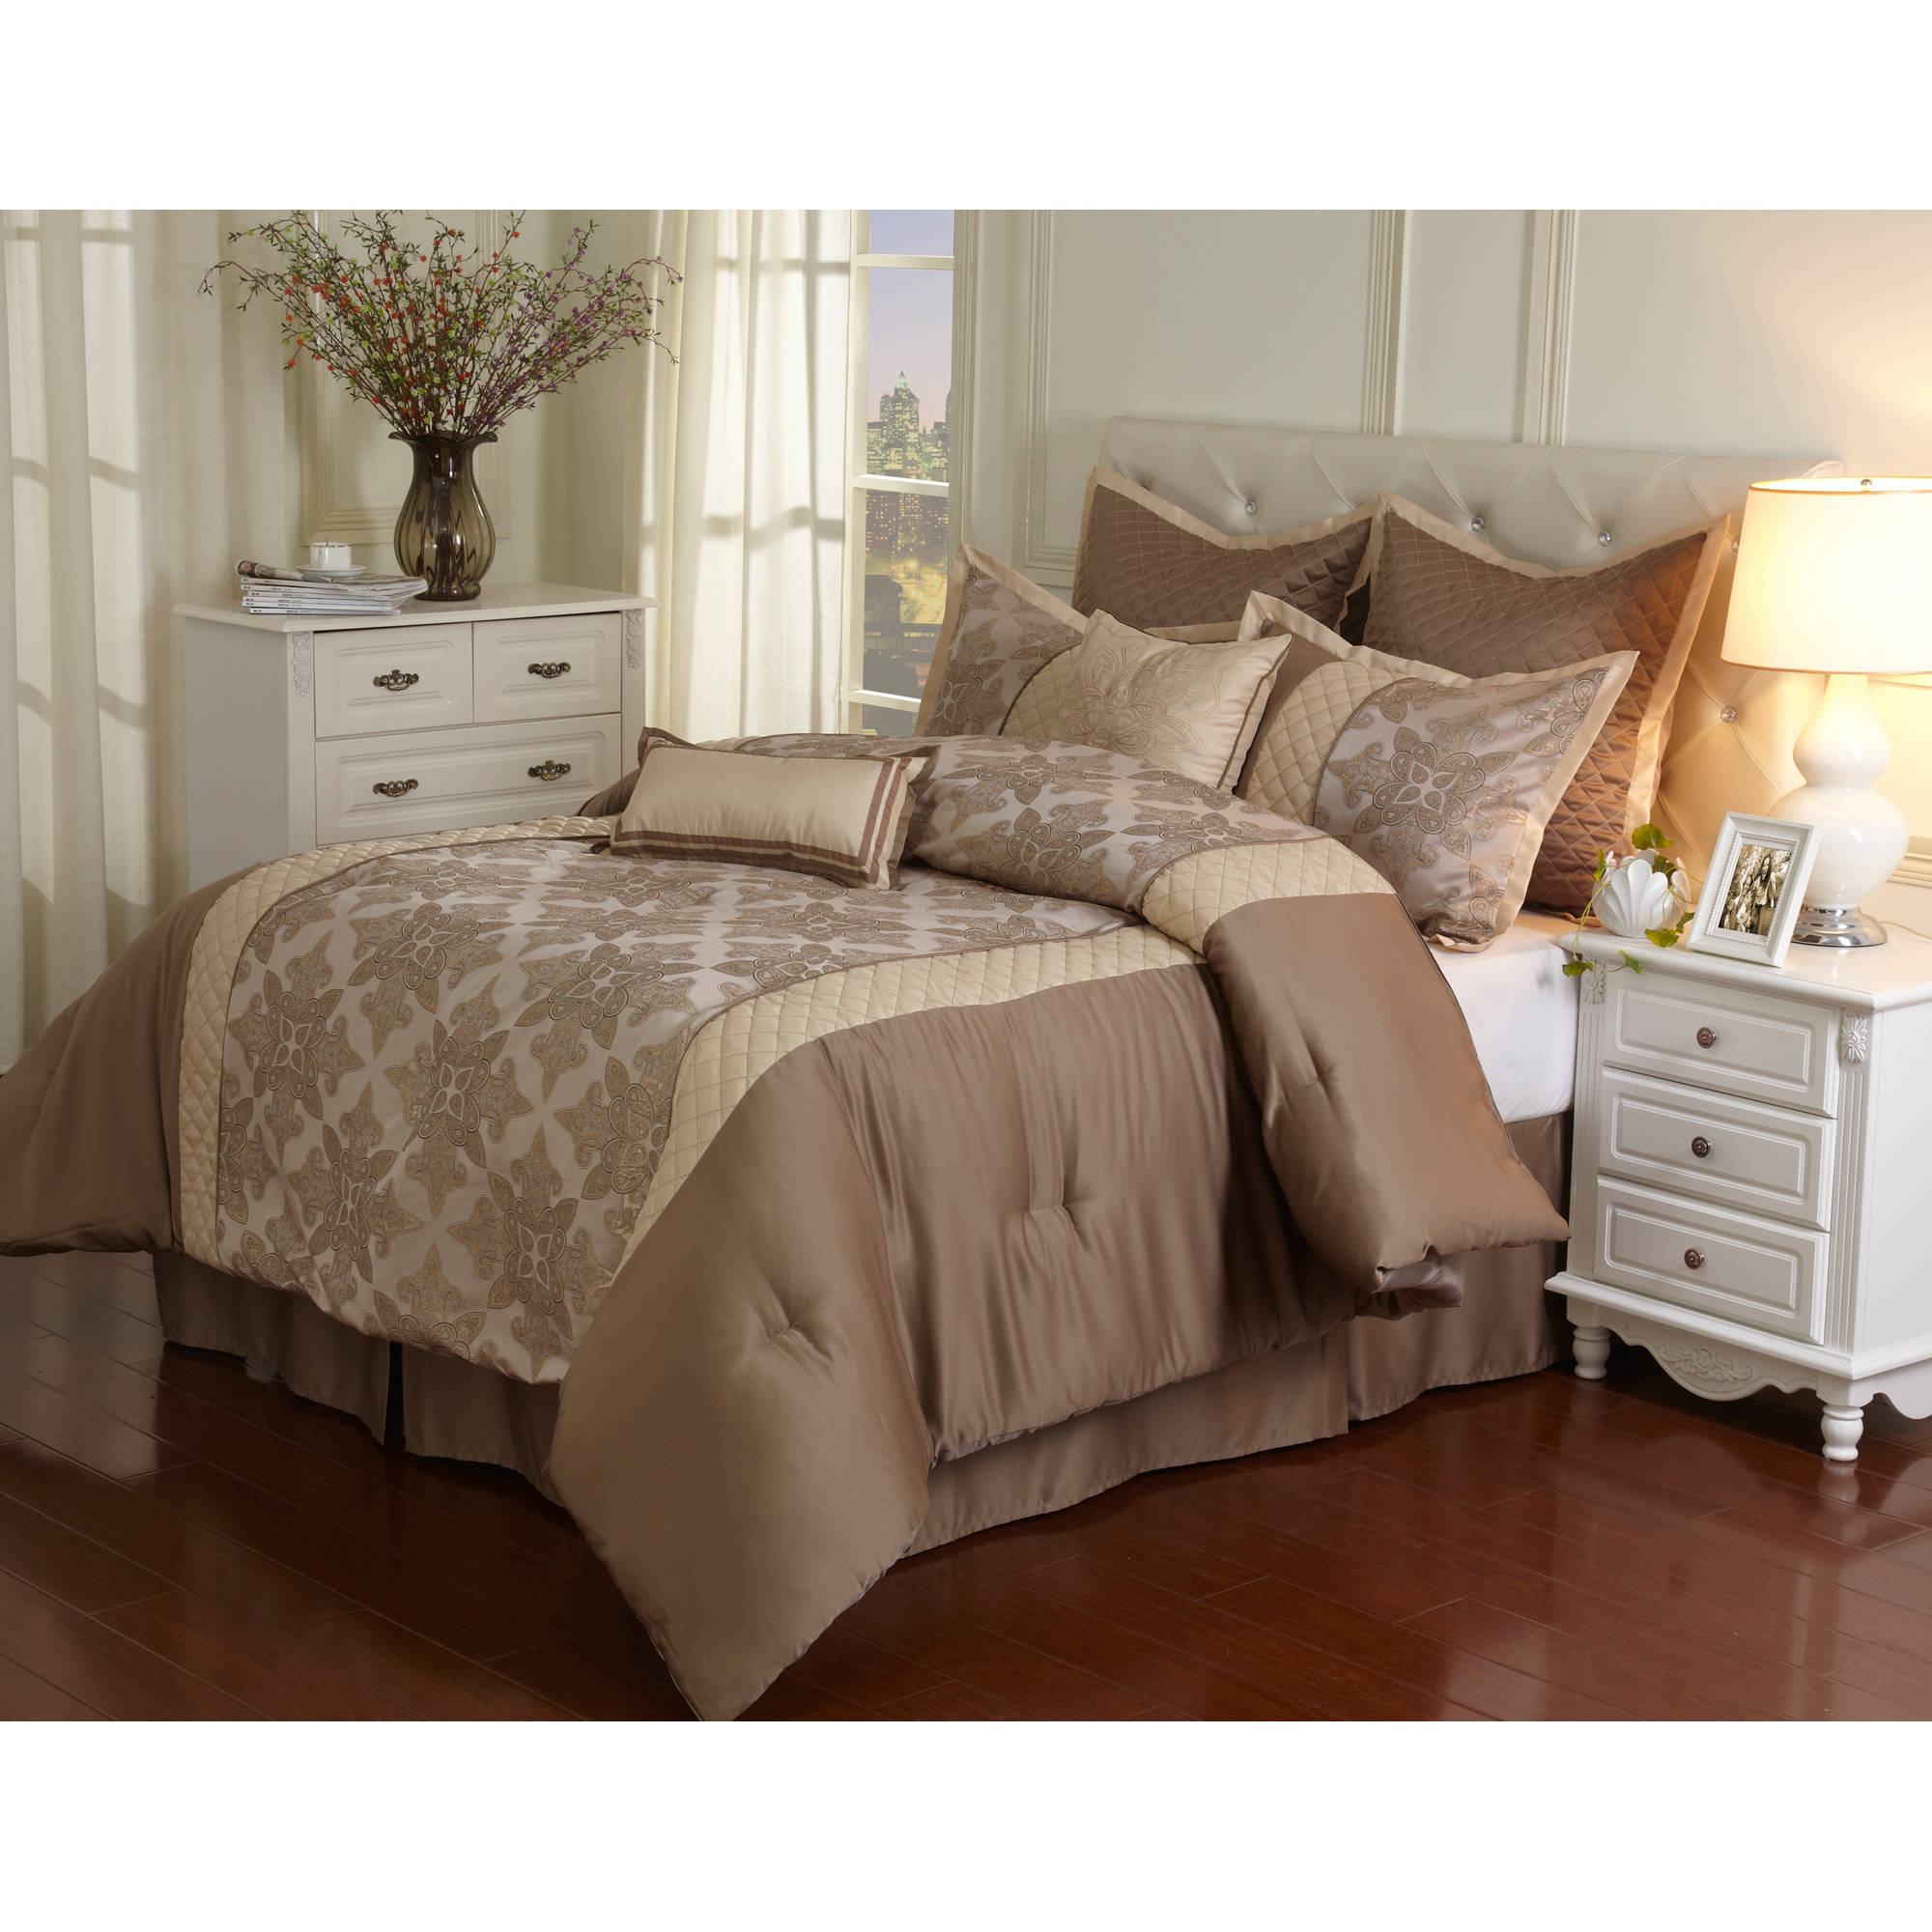 Stratford Park by Nanshing Fairmount 8-Piece Bedding Comforter Set